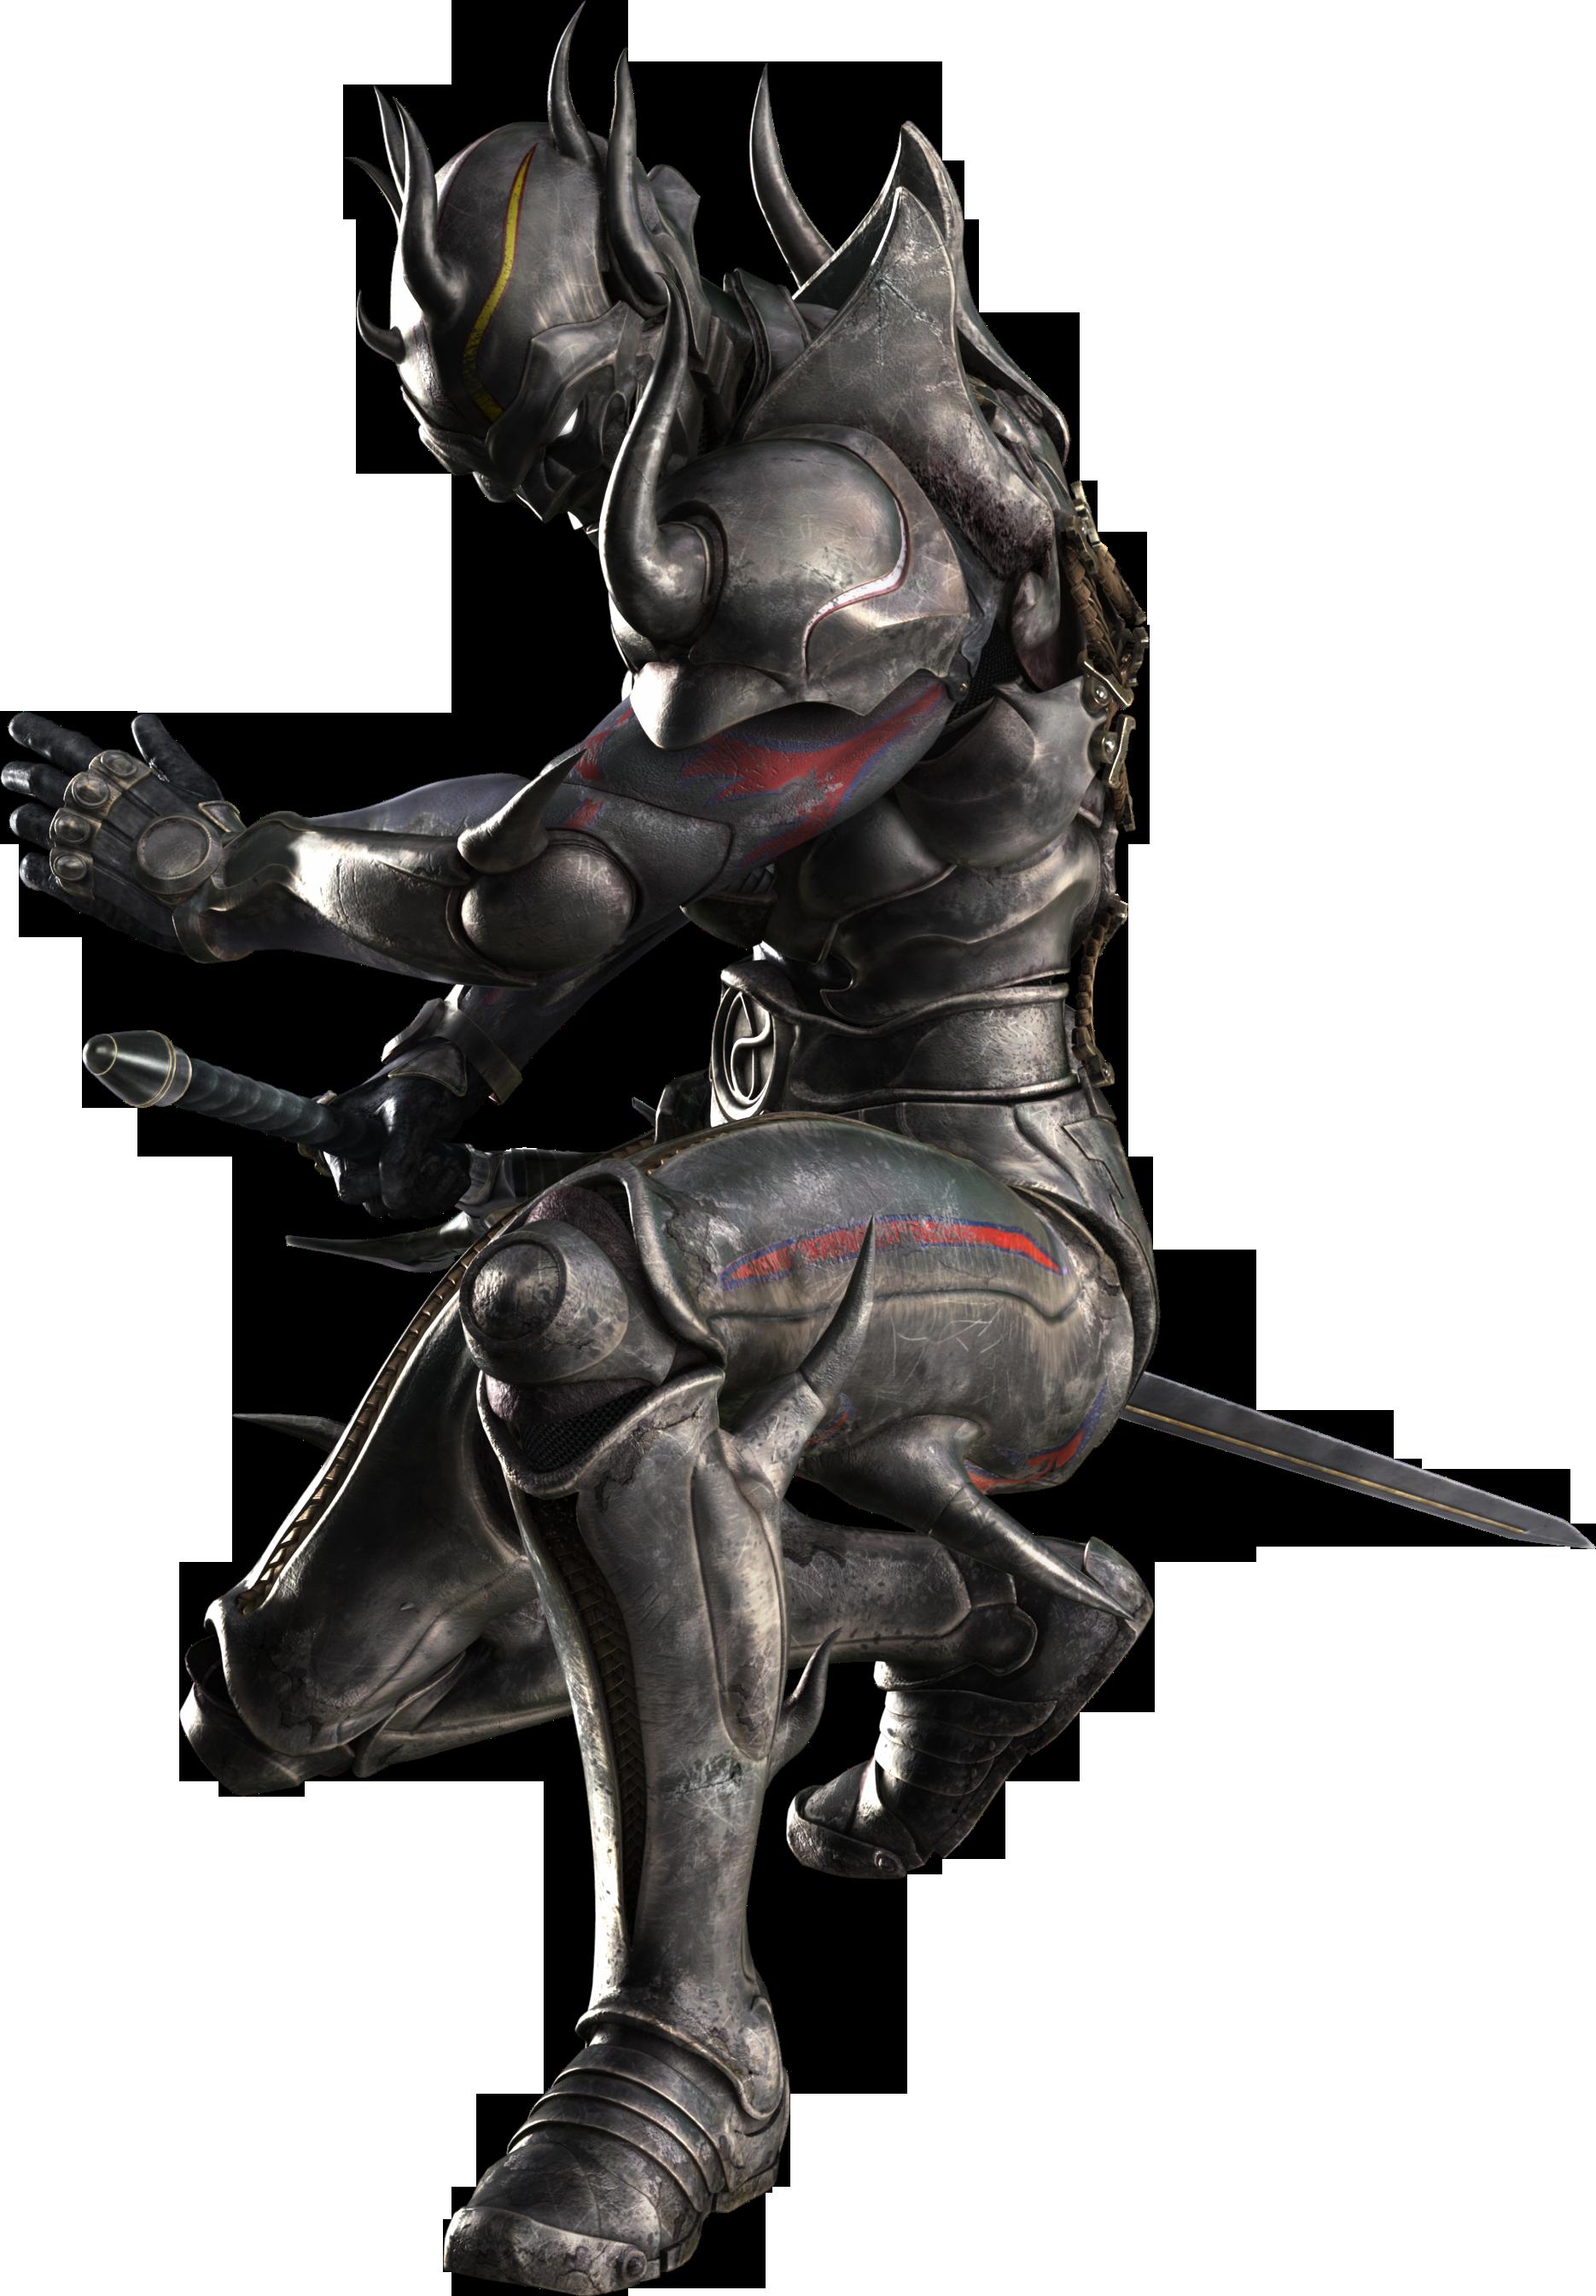 Dark Knight - The Final Fantasy Wiki has more Final Fantasy ...